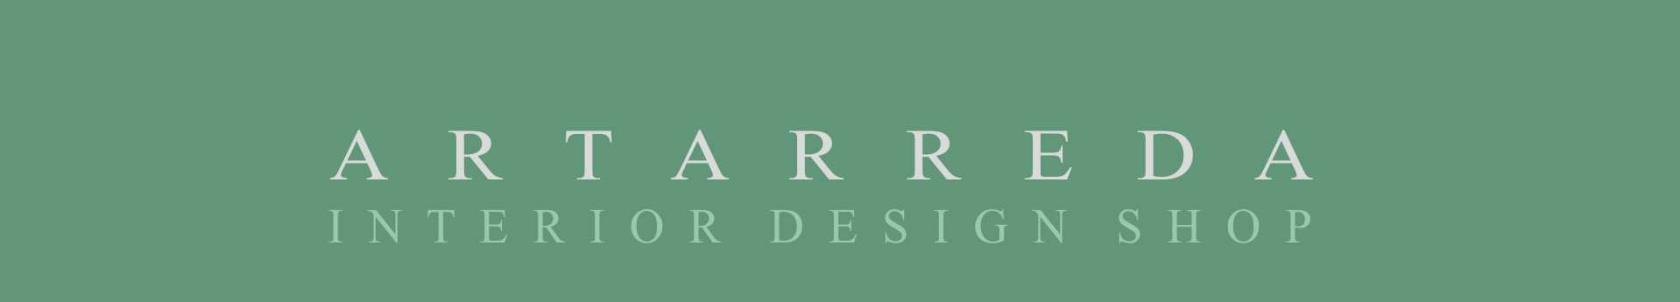 Vendita Complementi d'Arredo Tessuti d'Arredo Carta da Parati Illuminazione Imperia Savona Costa Azzurra | ARTARREDA